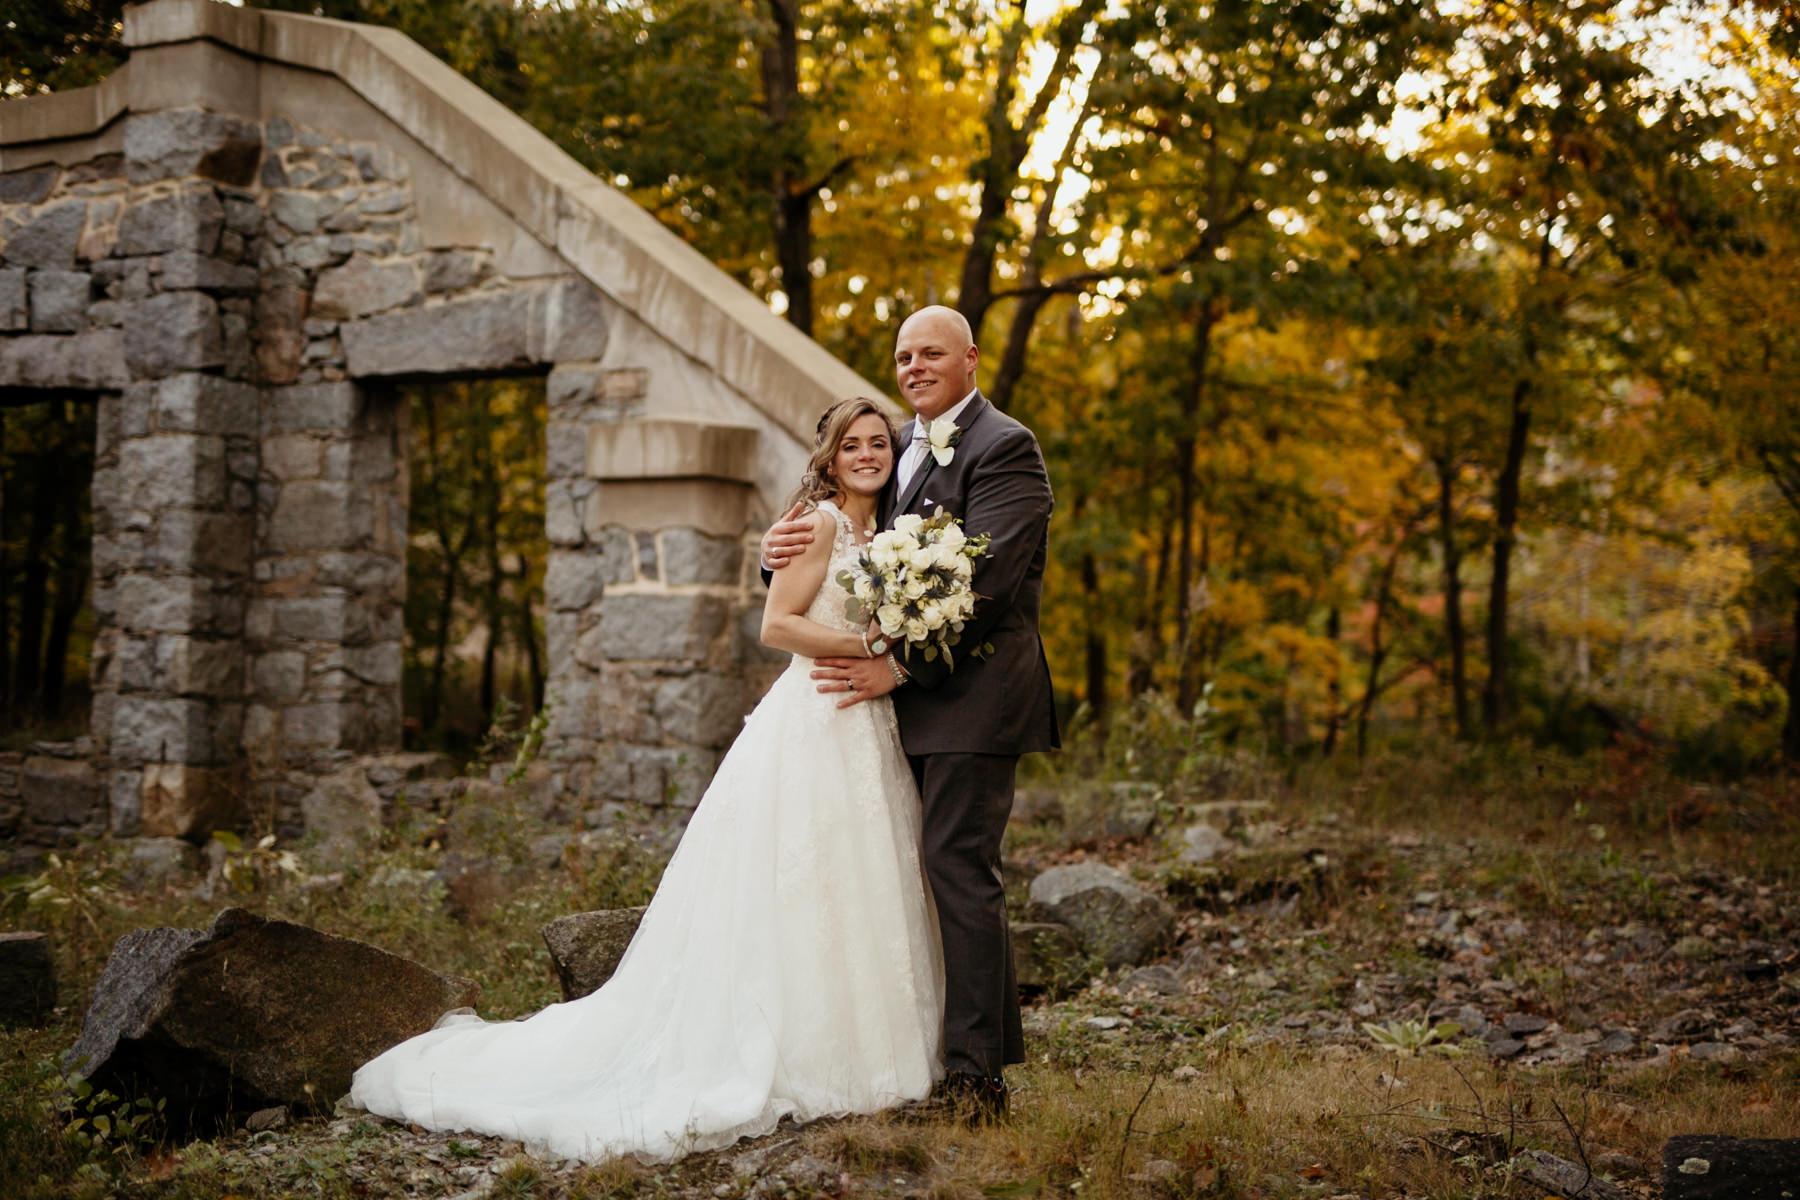 Quincy Ma Massachusetts Wedding Dedham Boston Granie Links Wedding New England Catholic Cathedral Liz Osban Photography 64.jpg